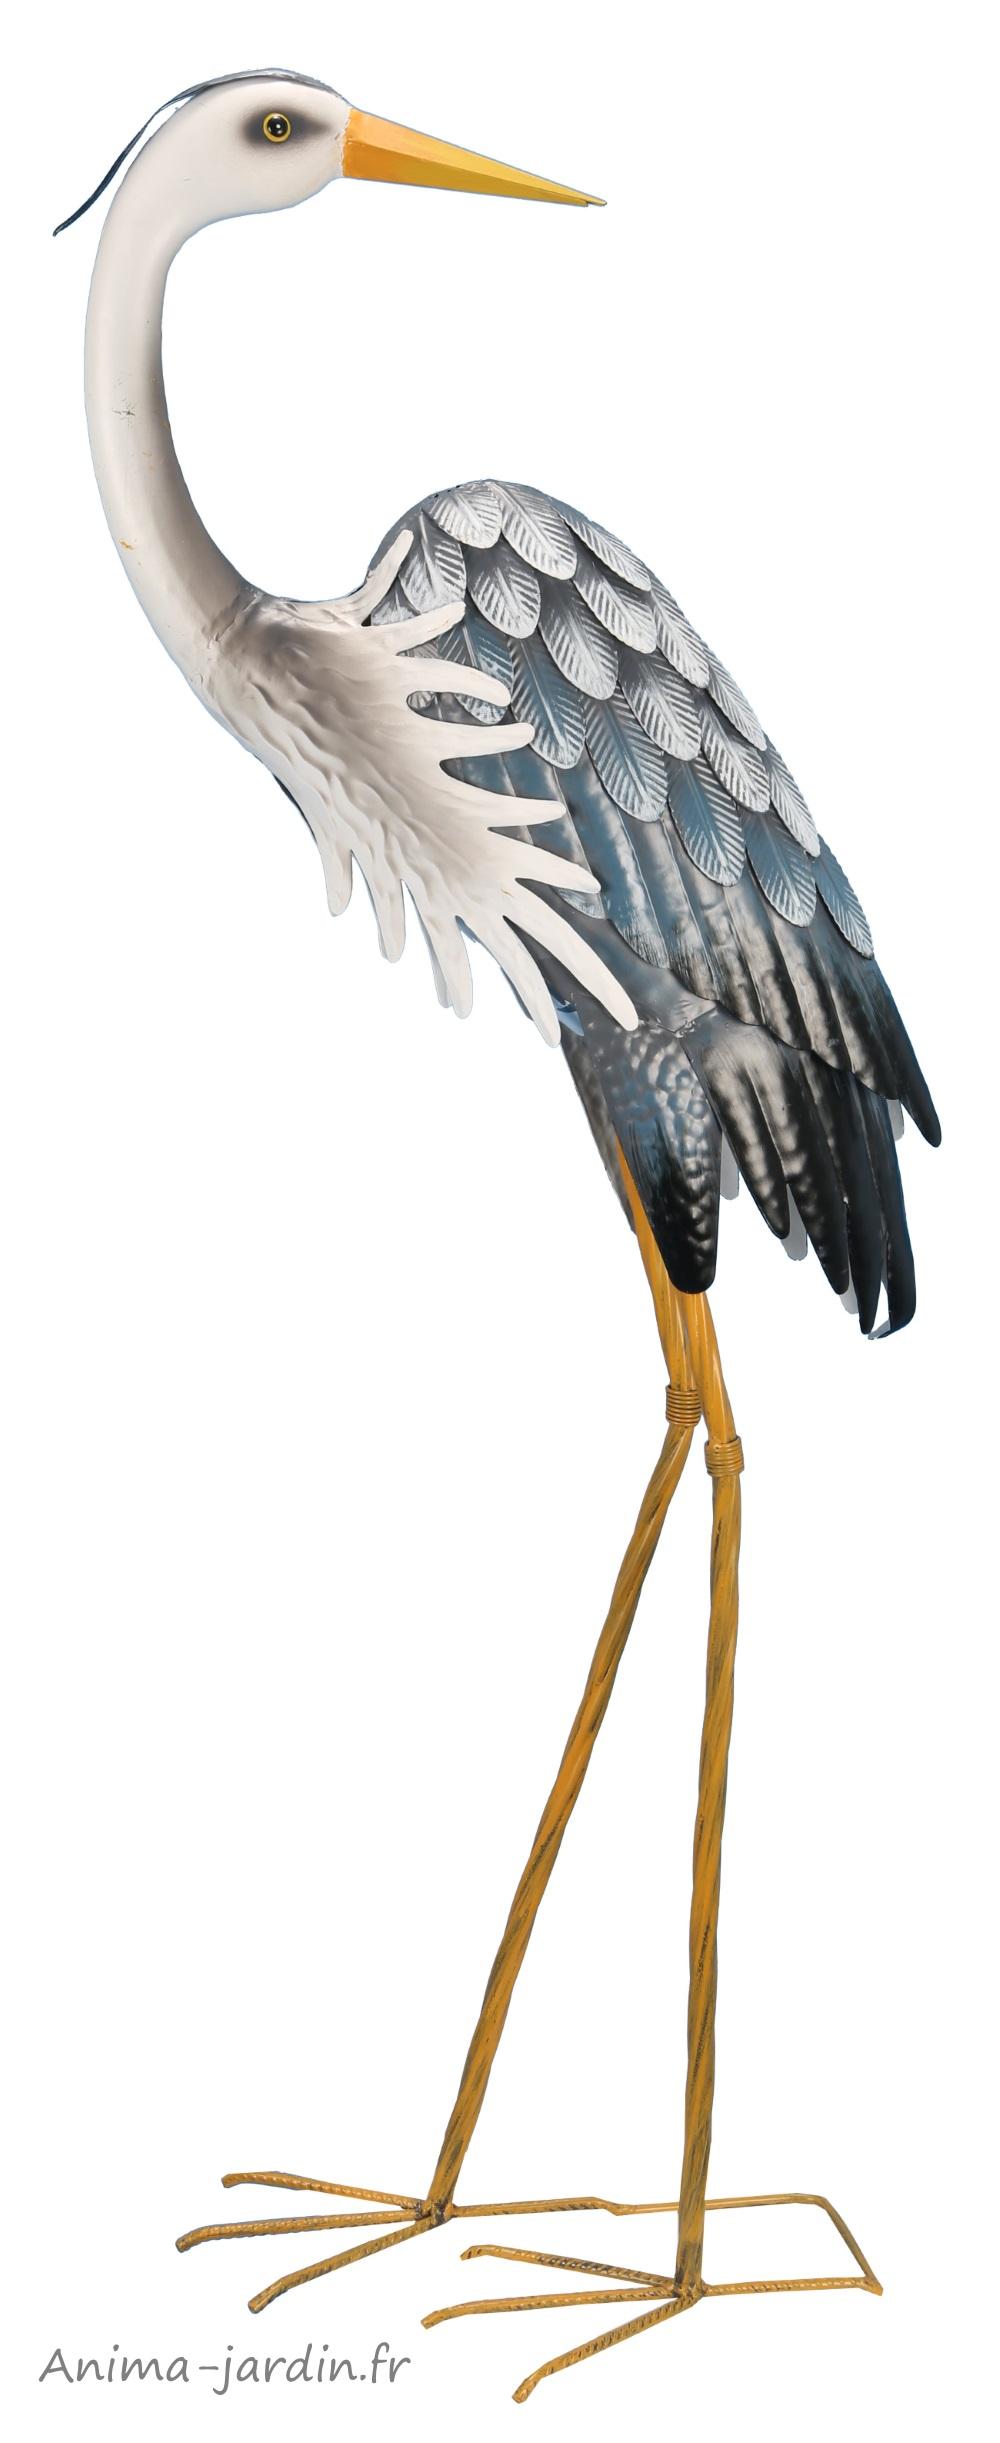 Héron-métal-oiseau-animal-riviera-pas cher-anima-jardin